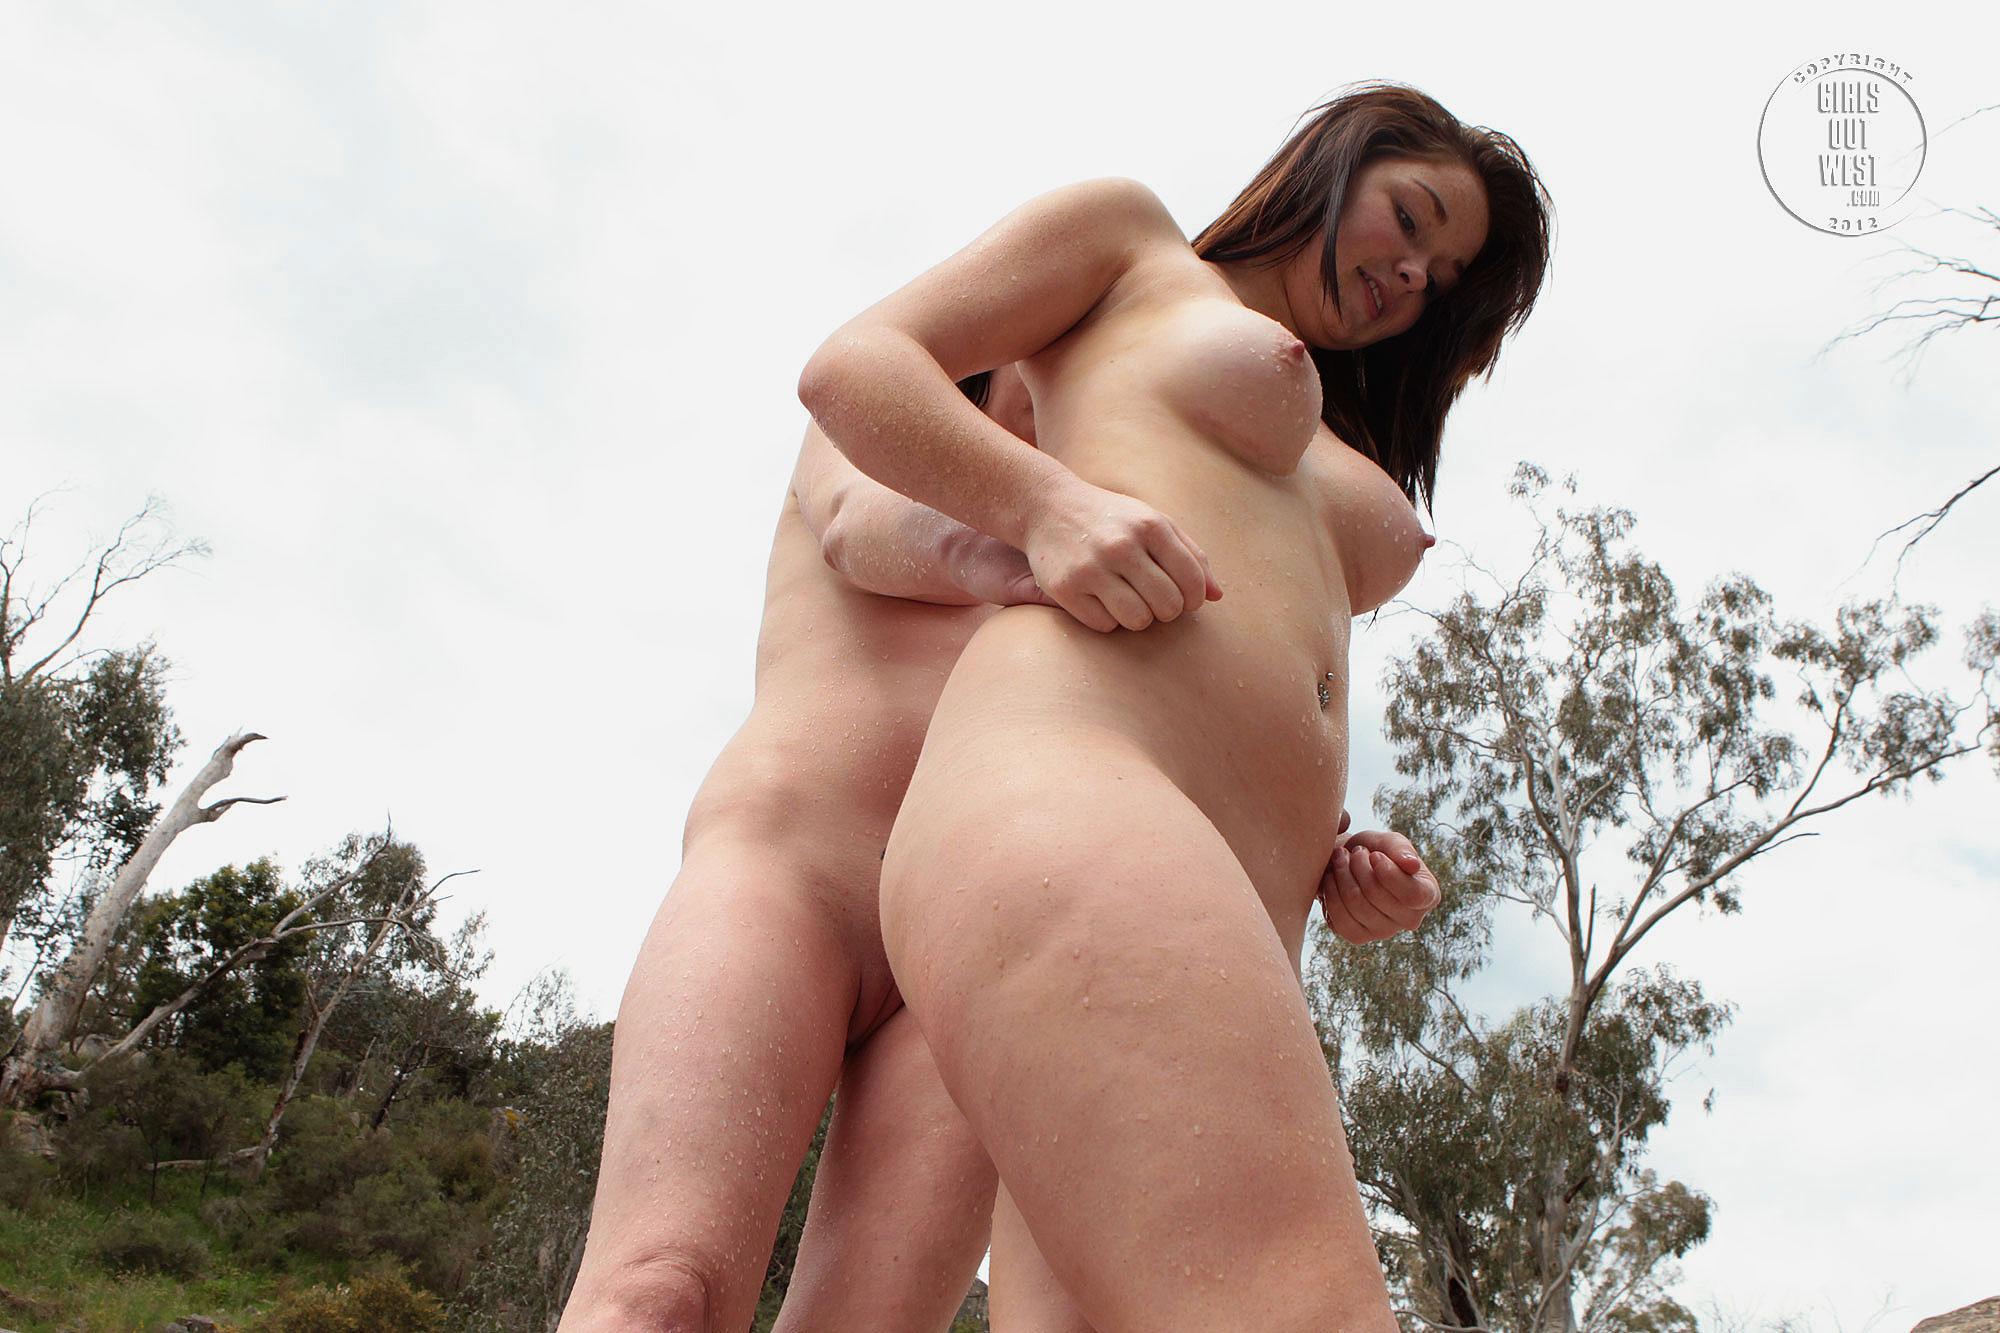 Nude girls sucking pussys